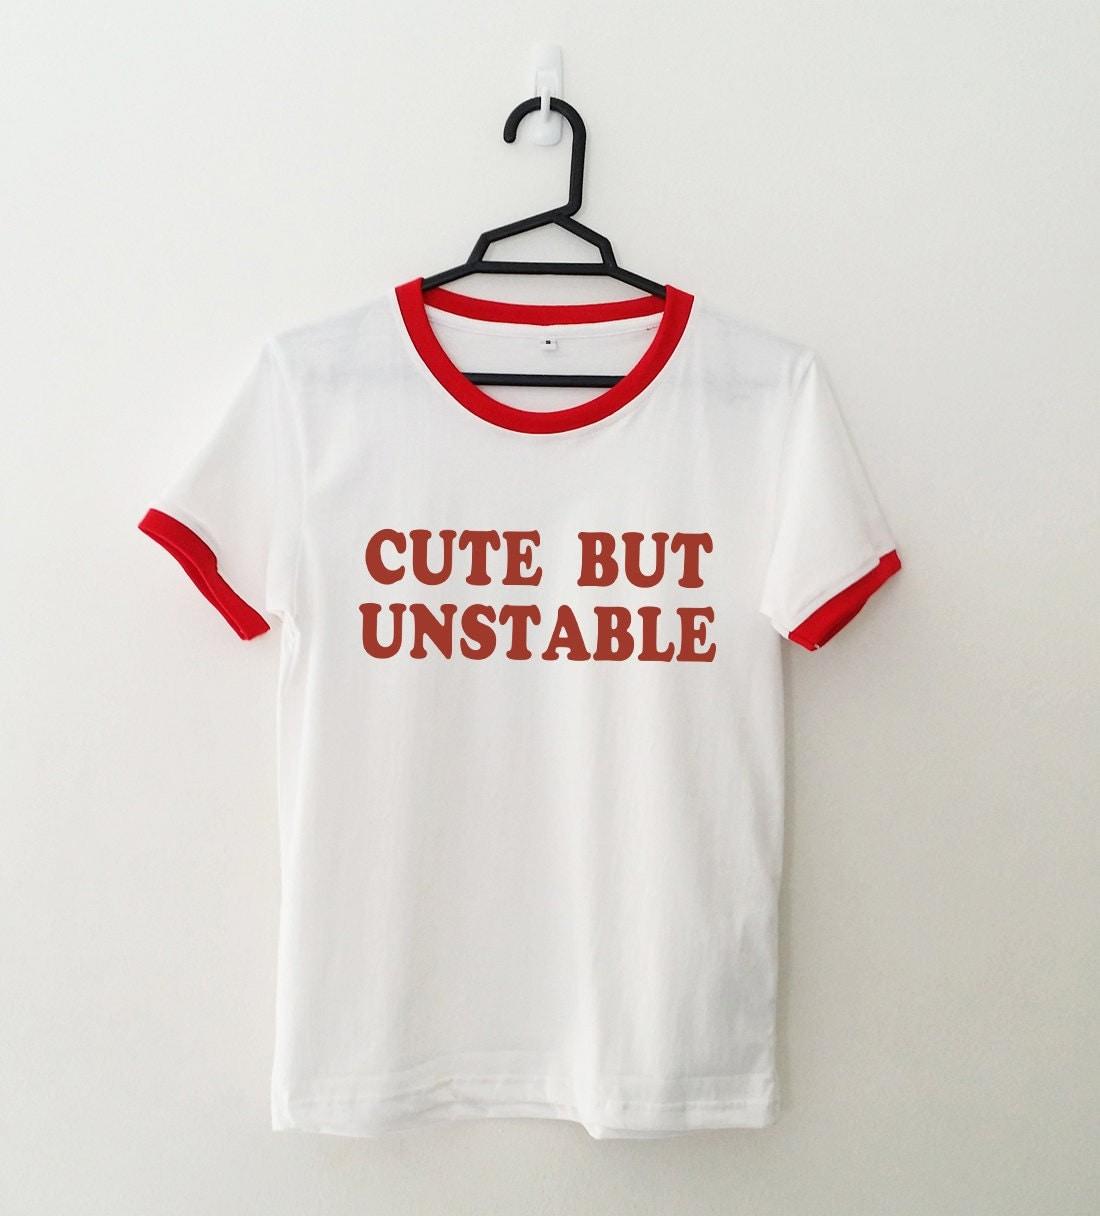 Cute but unstable tumblr shirts ringer tee Funny TShirt